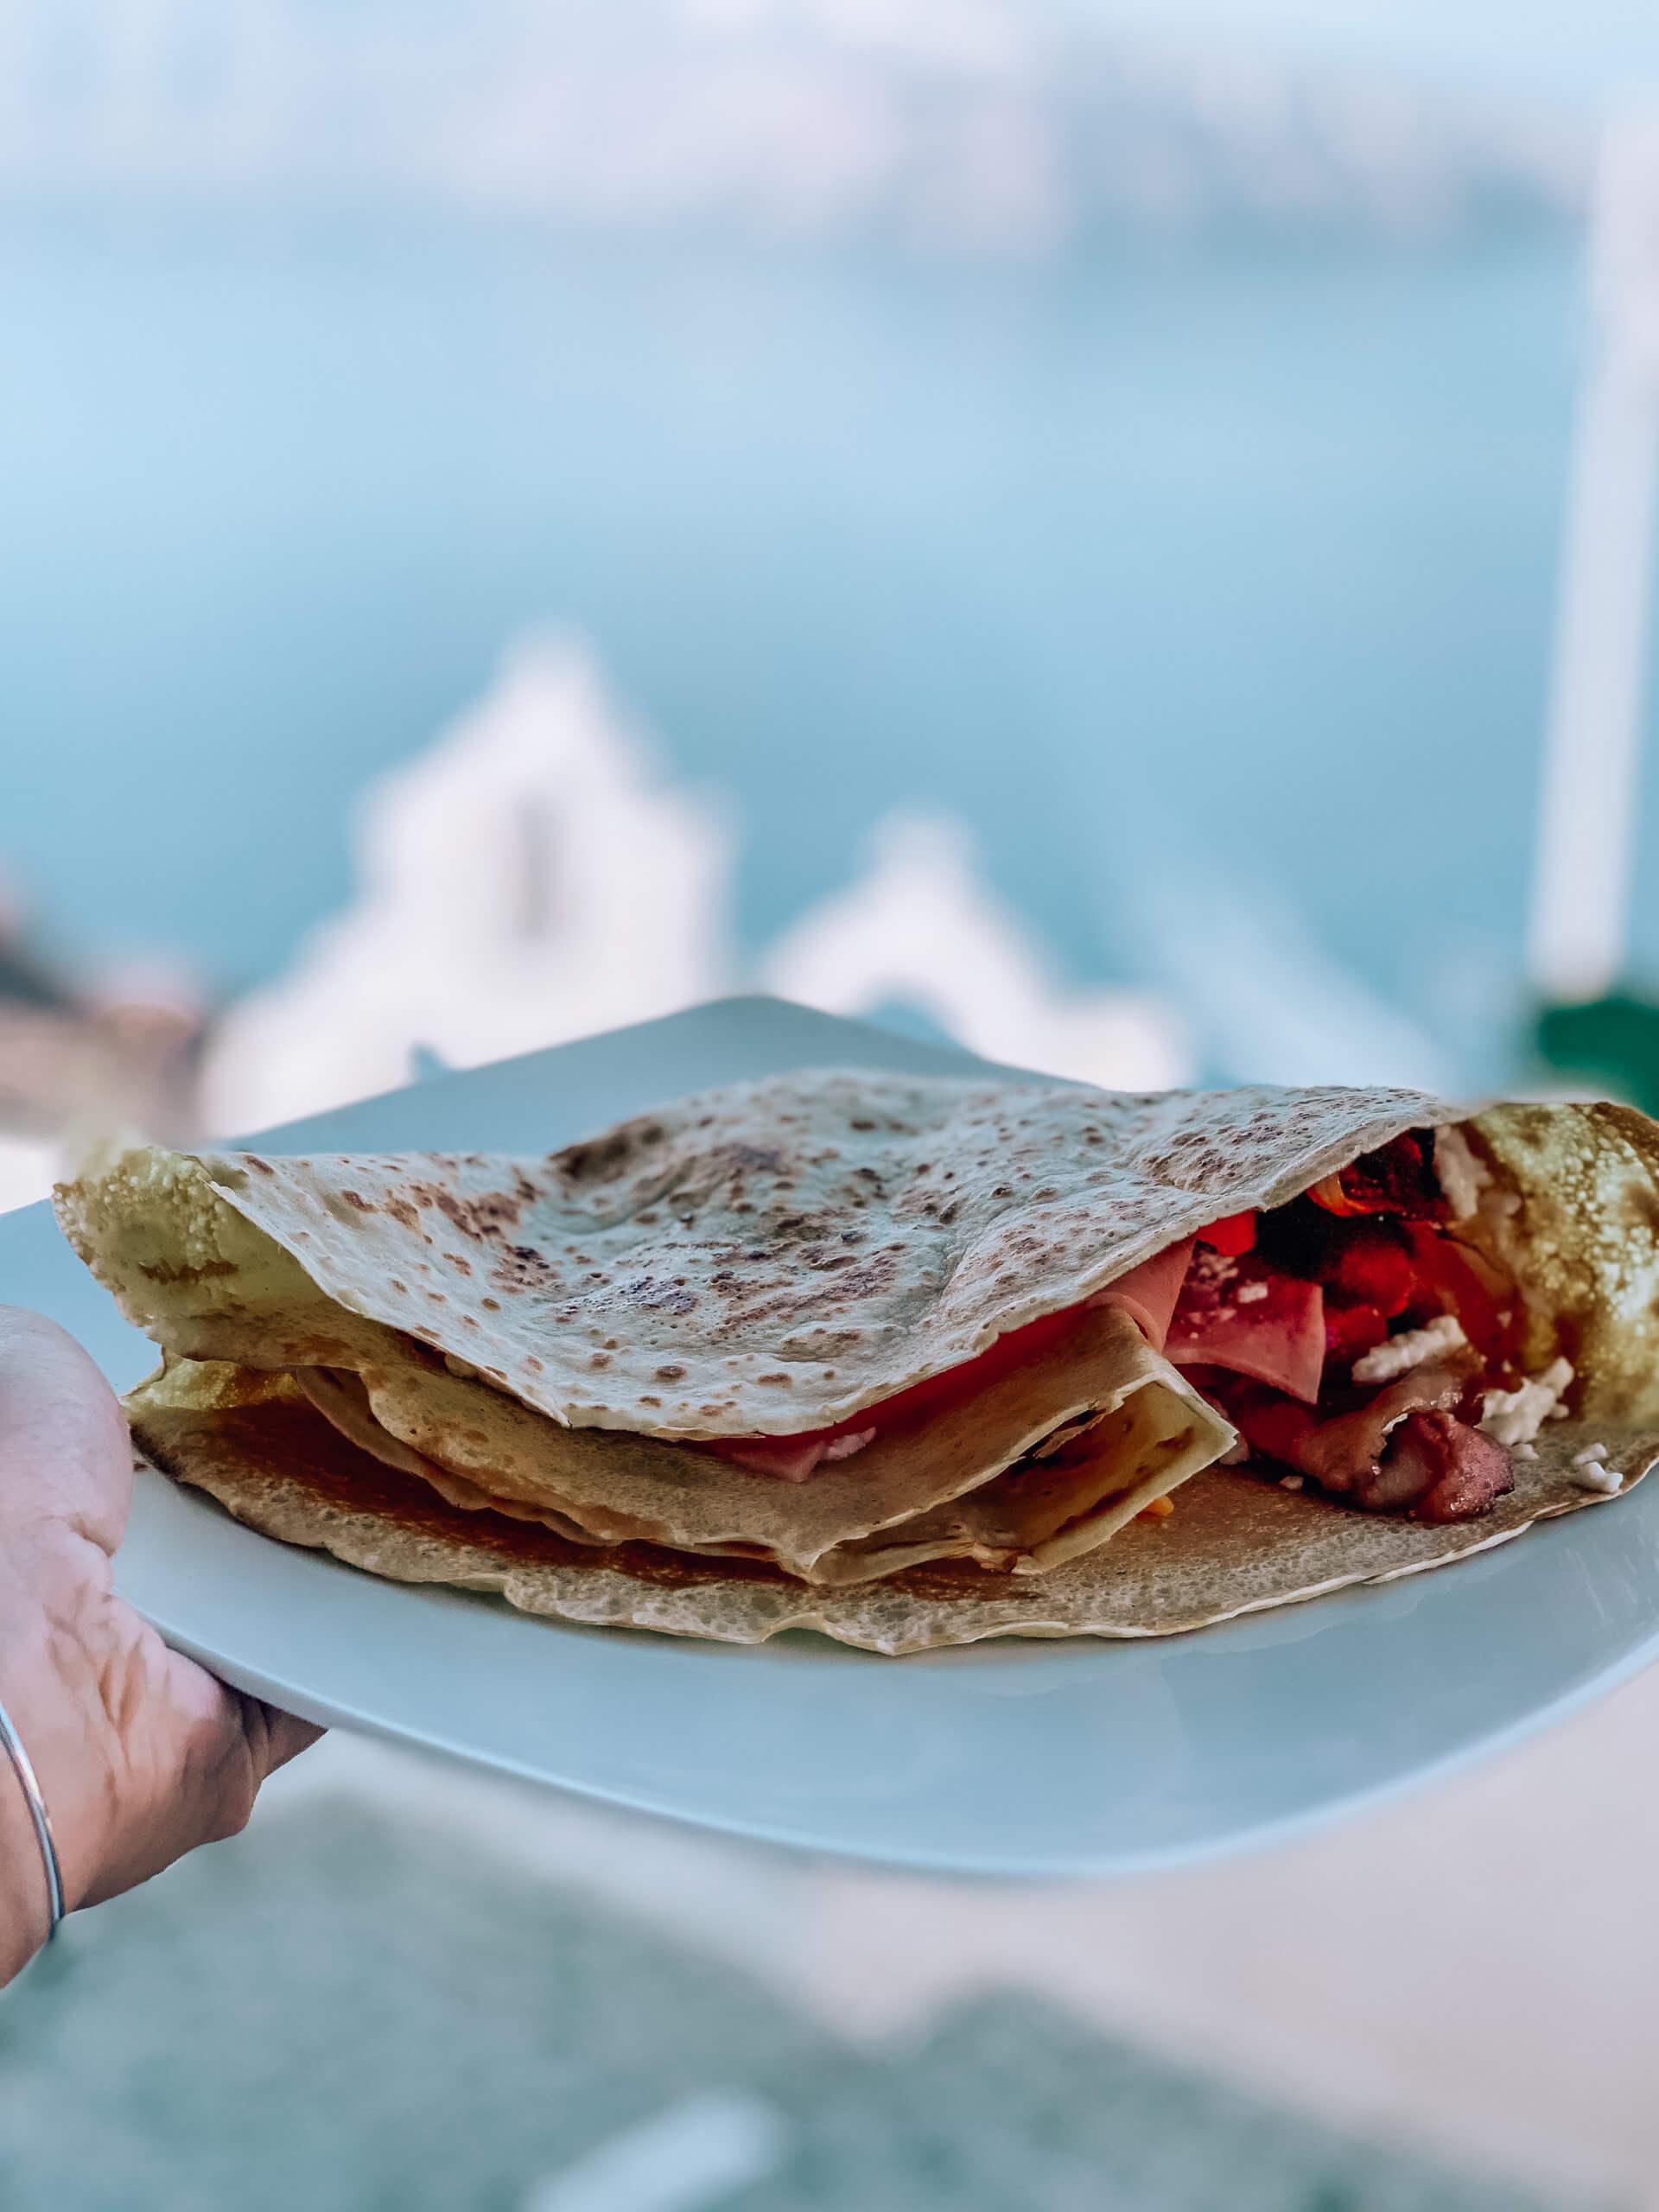 Santorini Top Best Restaurants |Vitrin Cafe Crepe